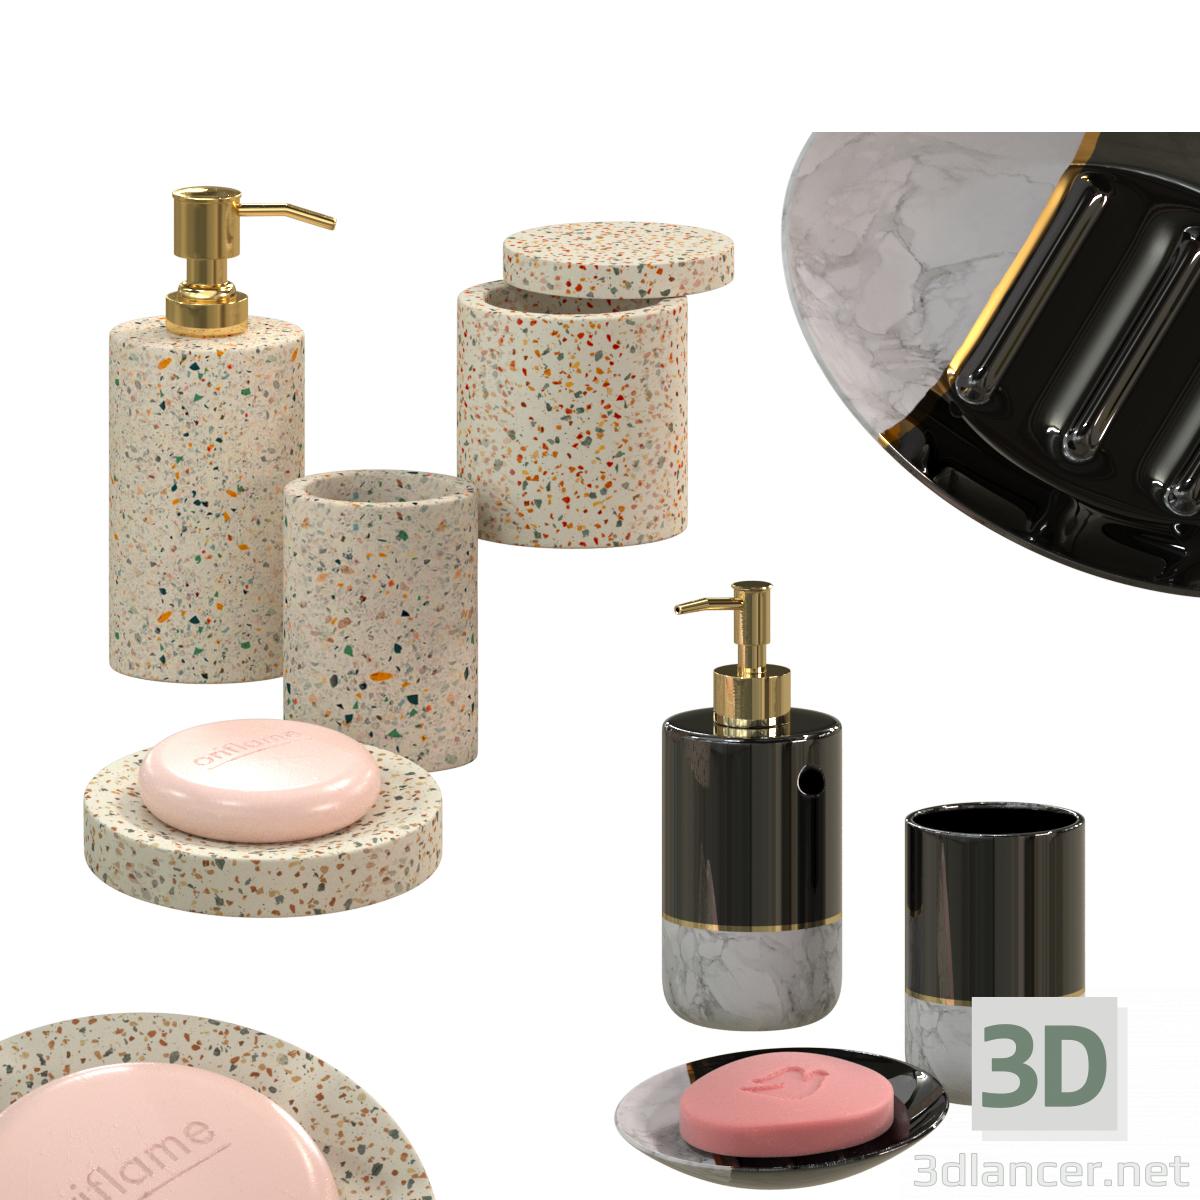 3d Bathroom set LA REDOUTE INTERIEURS model buy - render